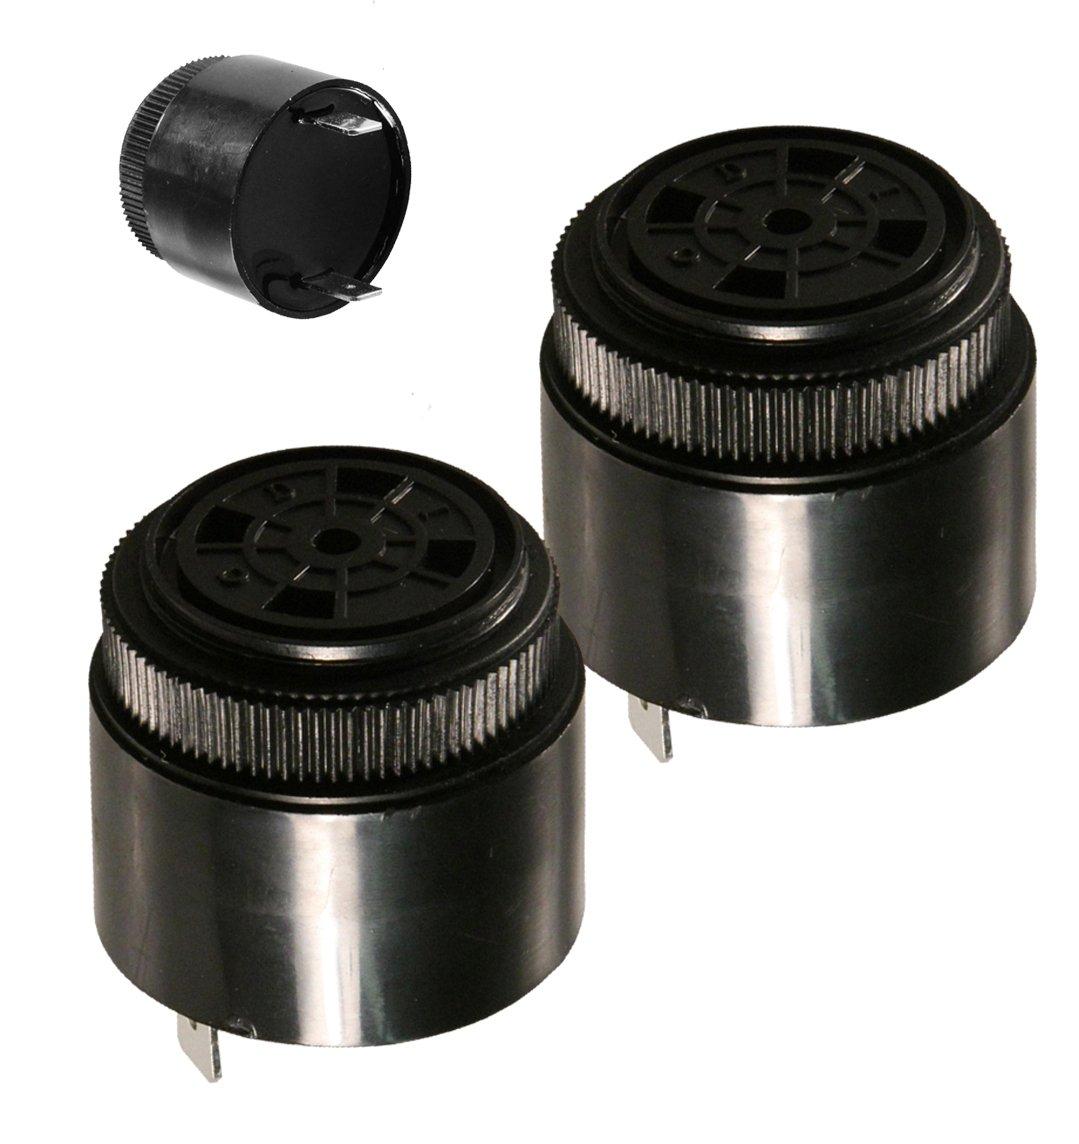 (2 Pieces) MULTICOMP MCKPI-G3721-120V-3992 PIEZO Buzzer Diameter: 36mm External Height: 32mm